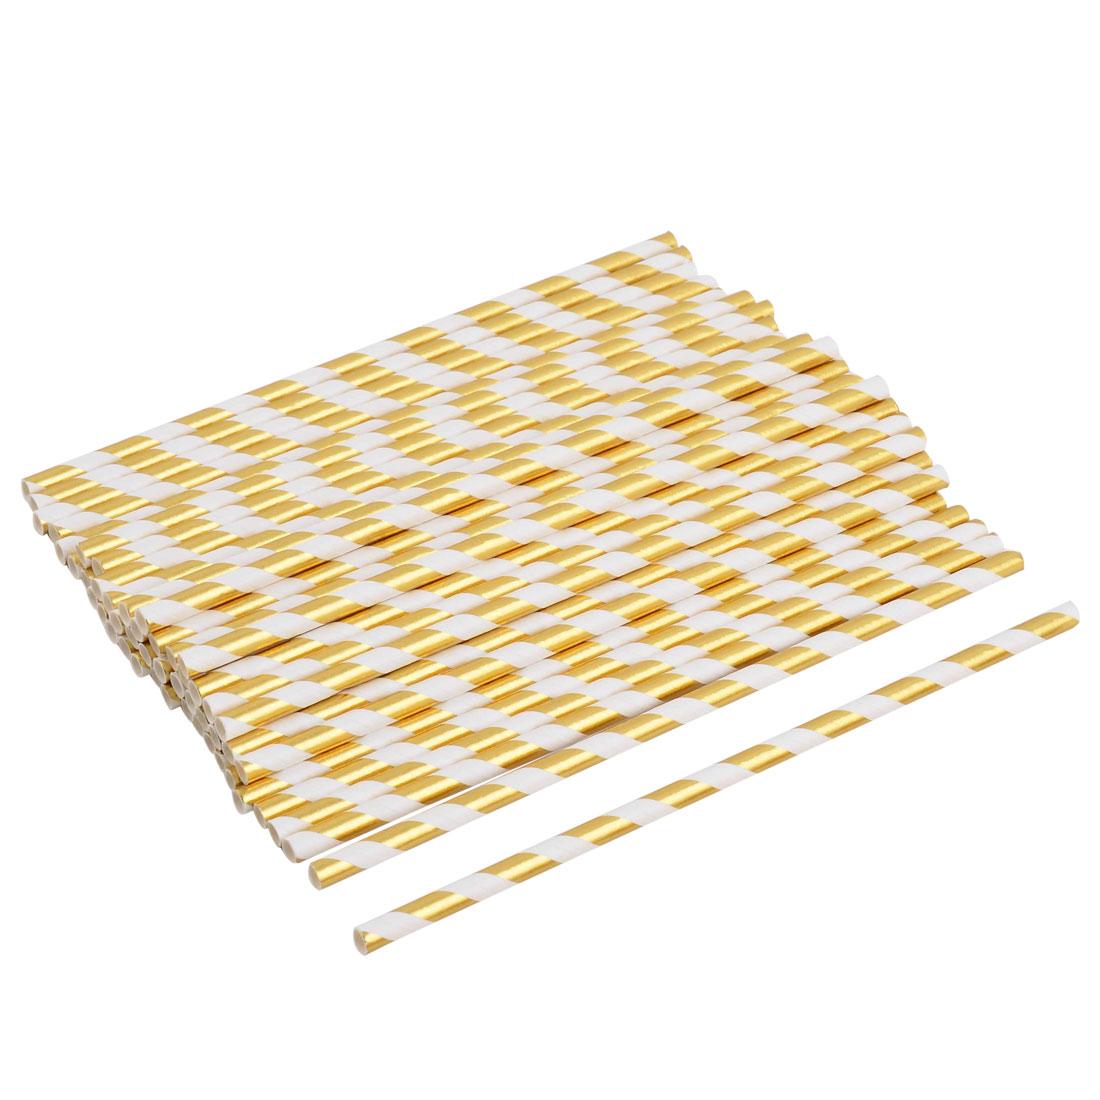 Unique BargainsPaper Diagonal Stripe Print Disposable Drinking Coffee Tea Straw Gold Tone 50pcs